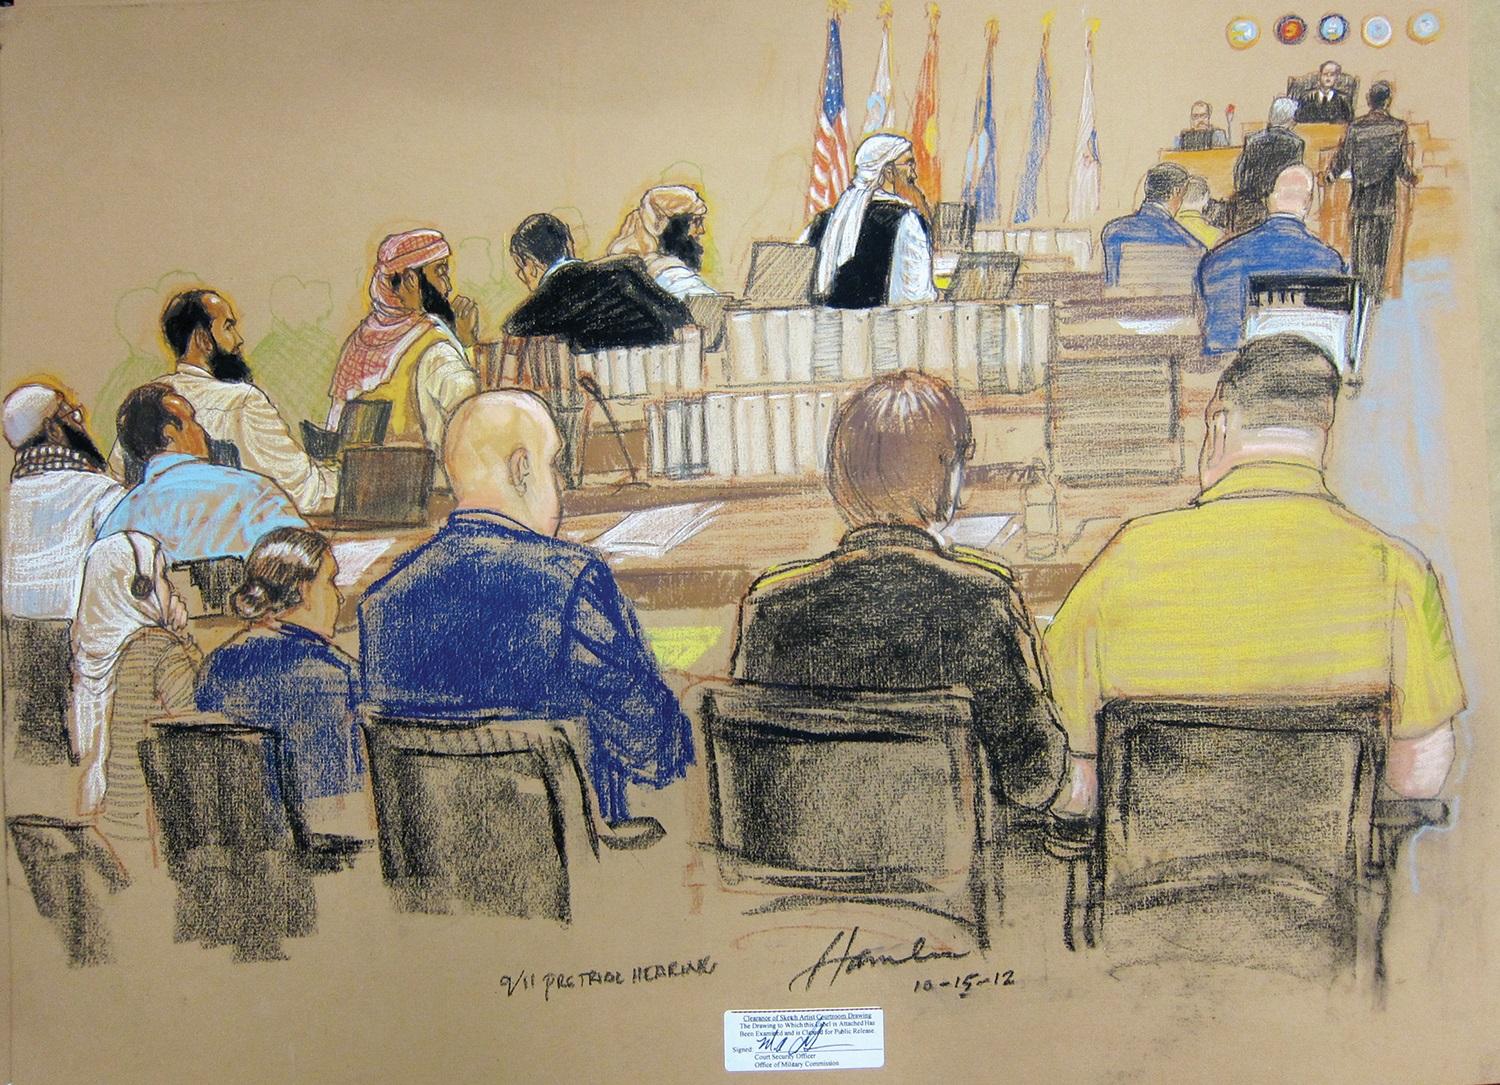 Photo credit: court artist Janet Hamlin